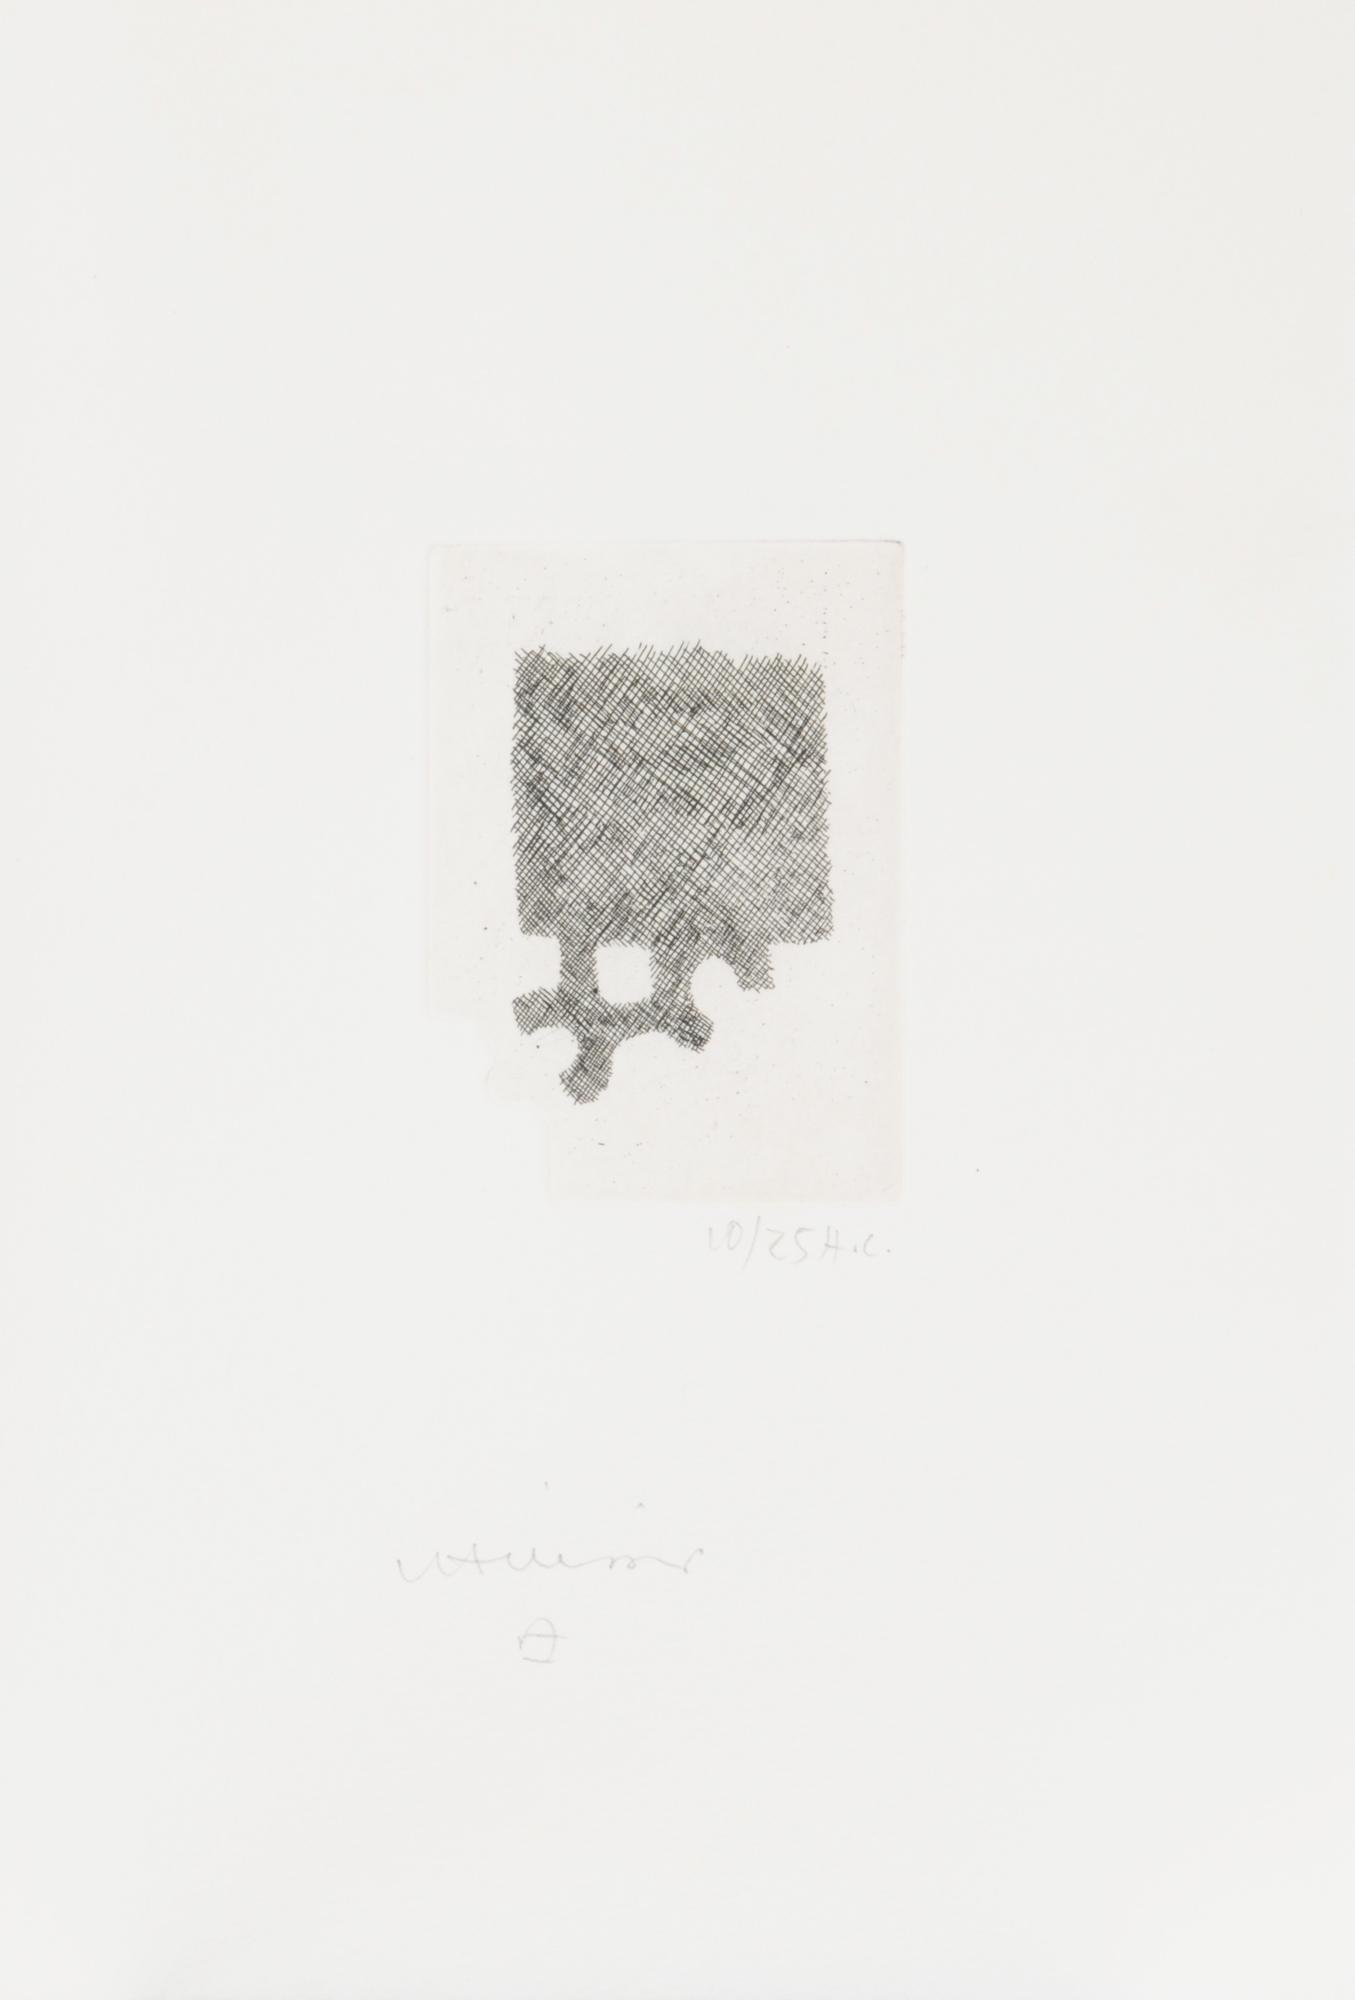 Chillida Eduardo, Book. La sortie d'Égypte